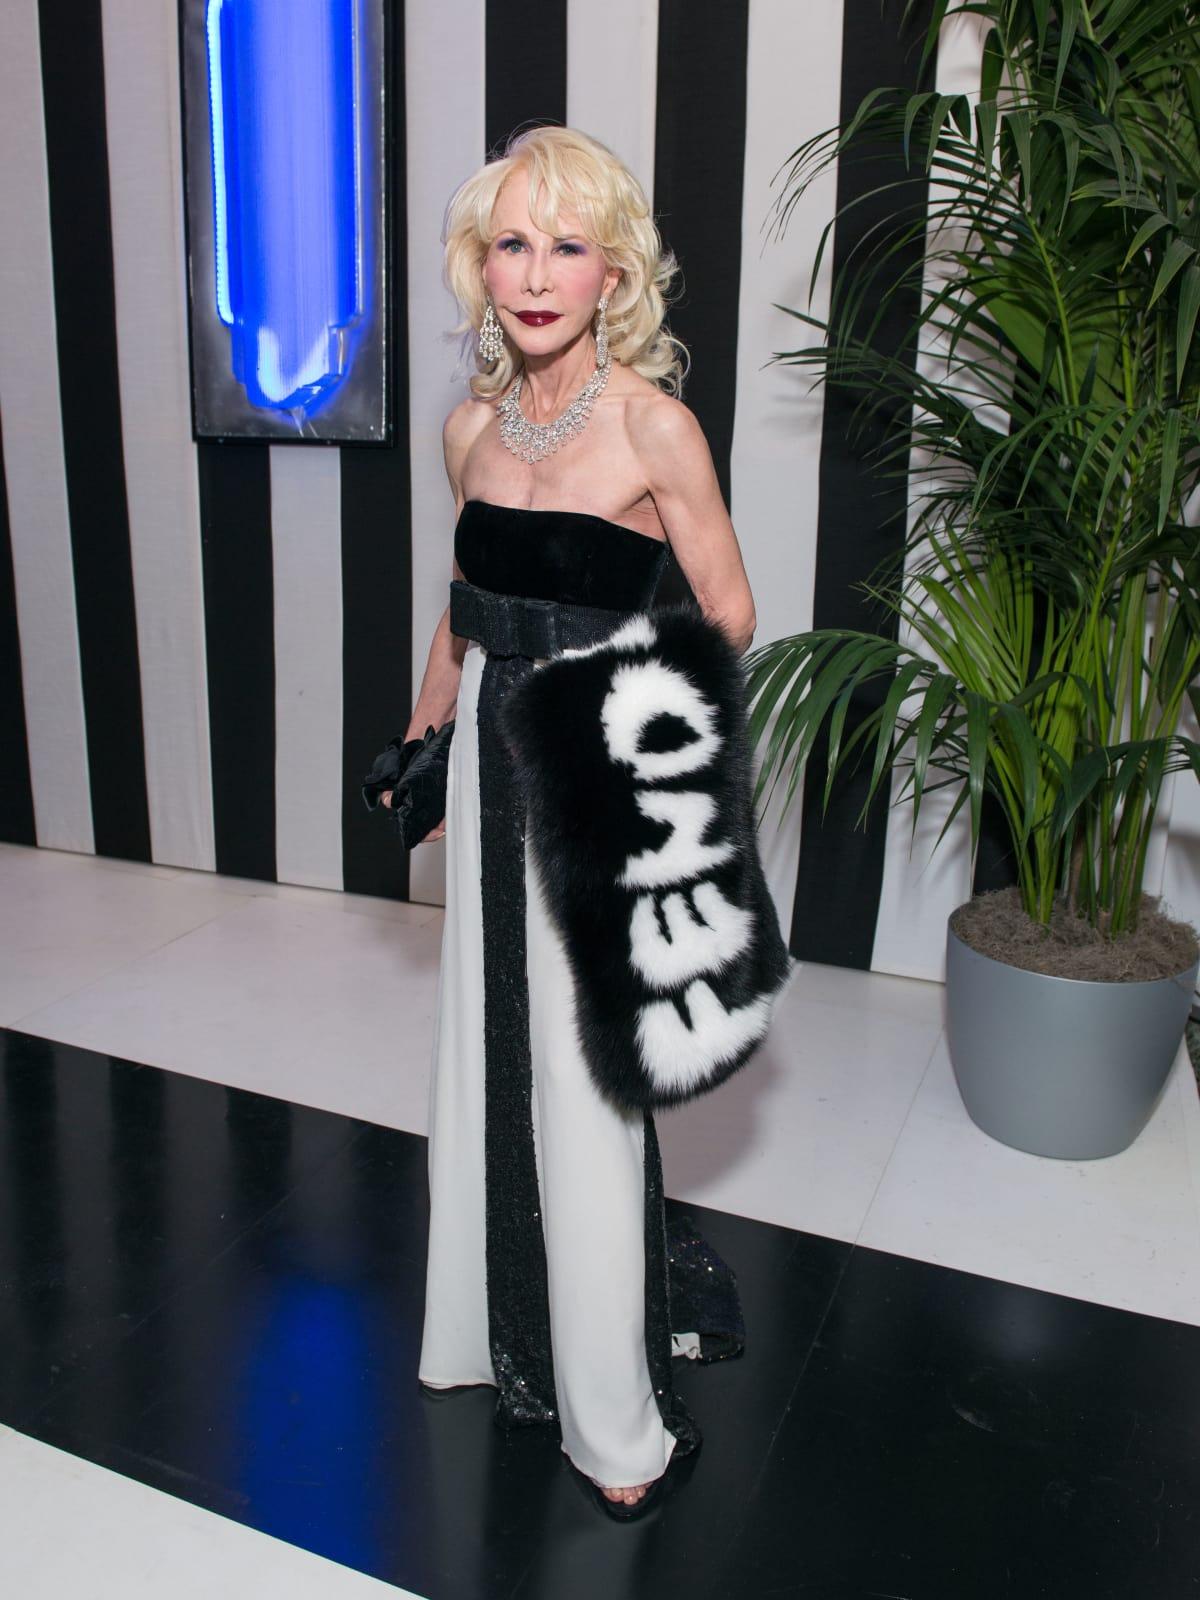 News, Shelby, MFAH gala gowns, Oct. 2015 Diane Lokey Farb, Valentino gown, Fendi fur